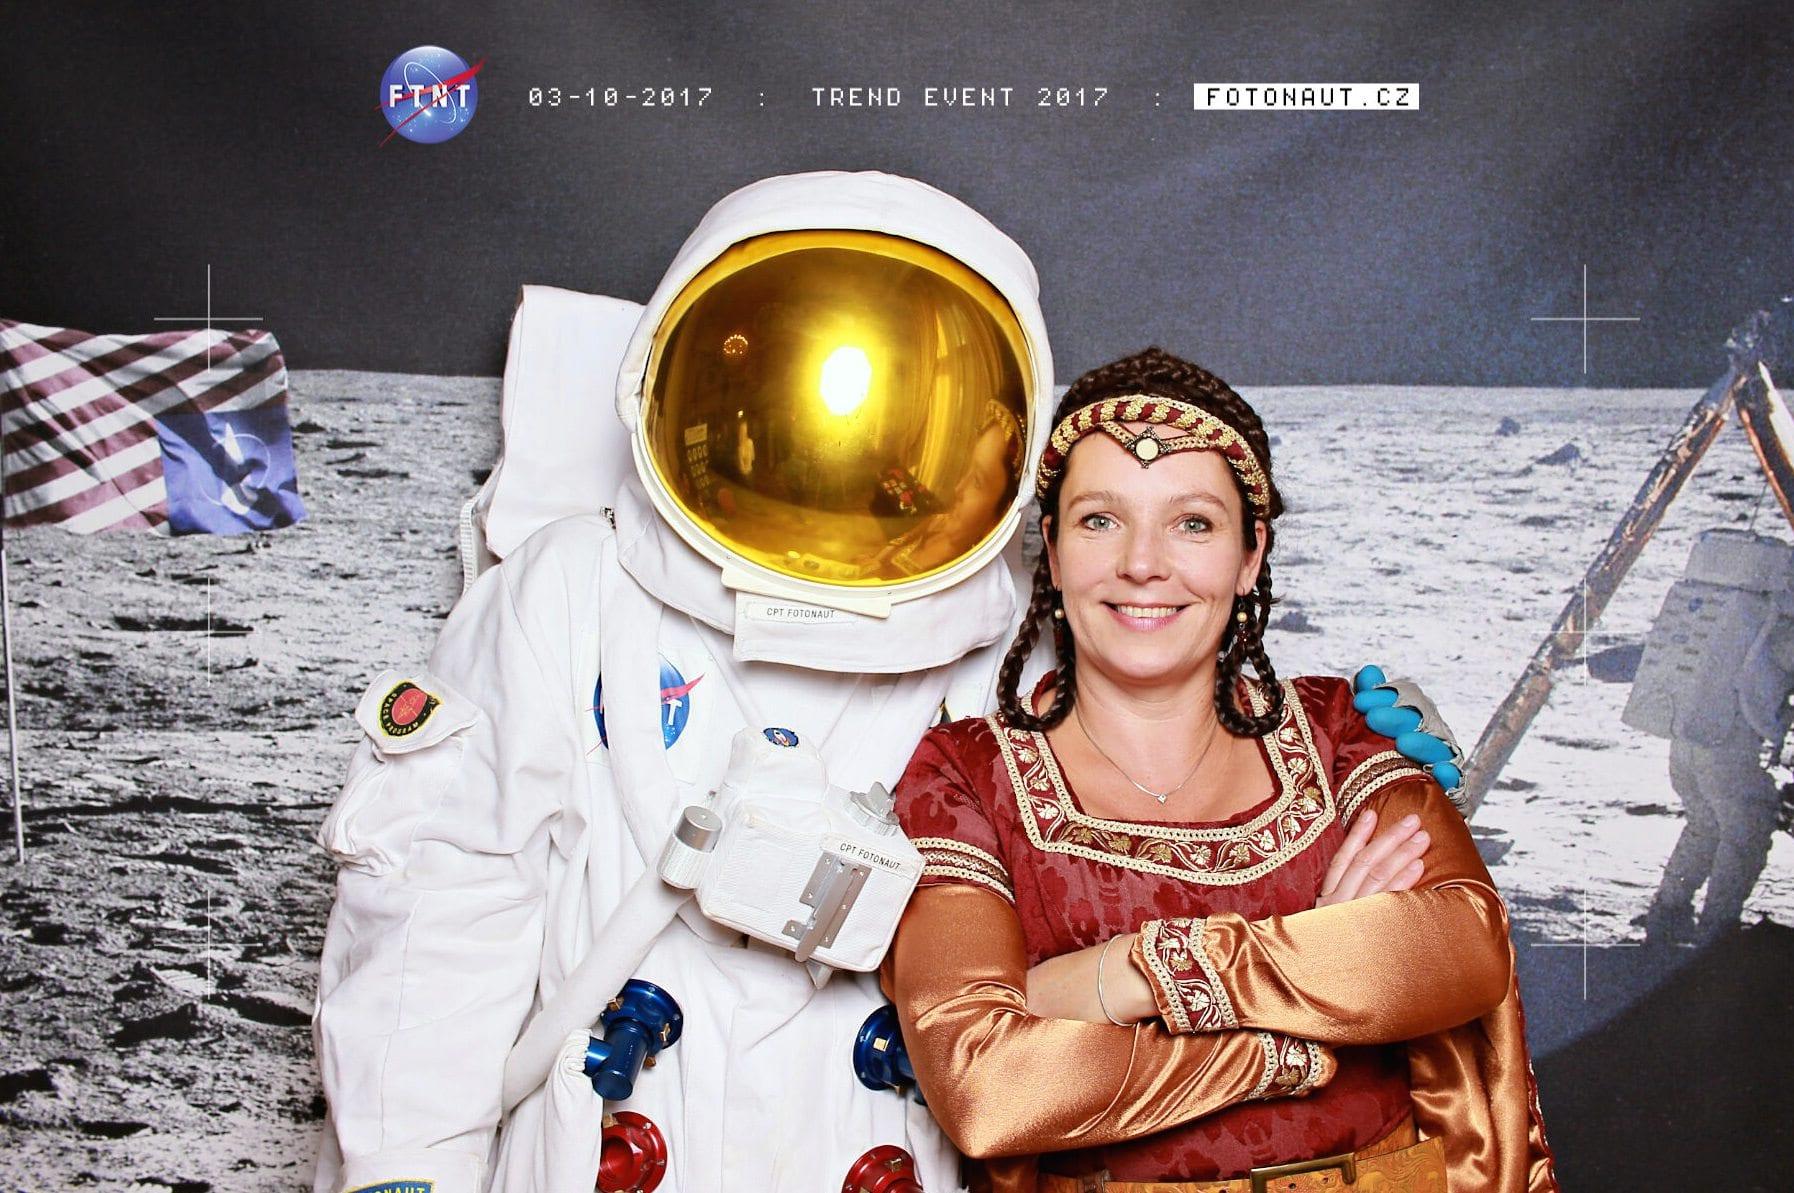 fotokoutek-trend-event-2017-3-10-2017-322421